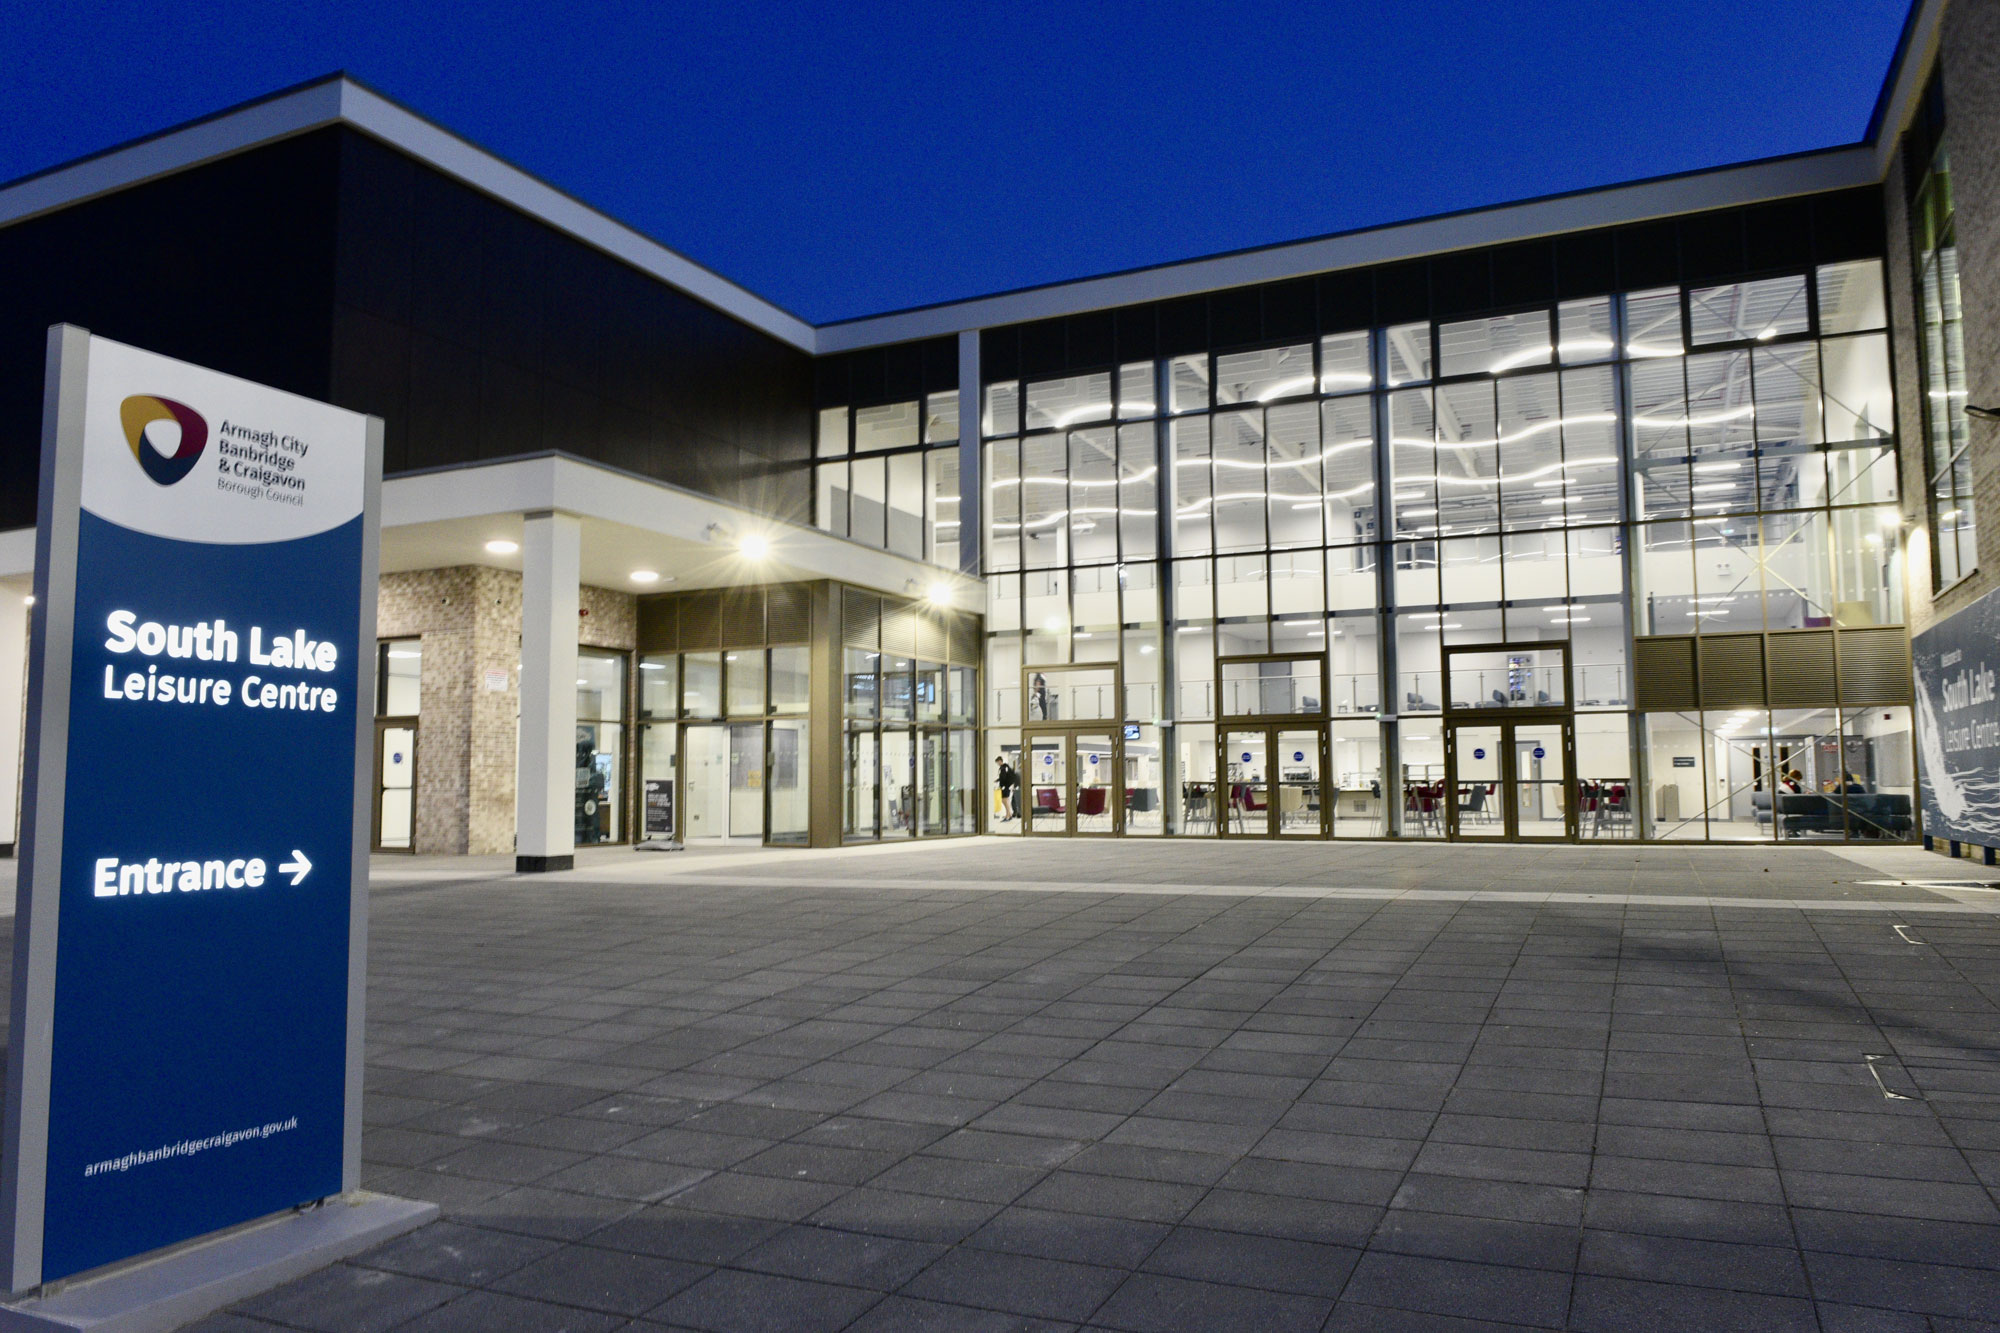 South Lake Leisure Centre